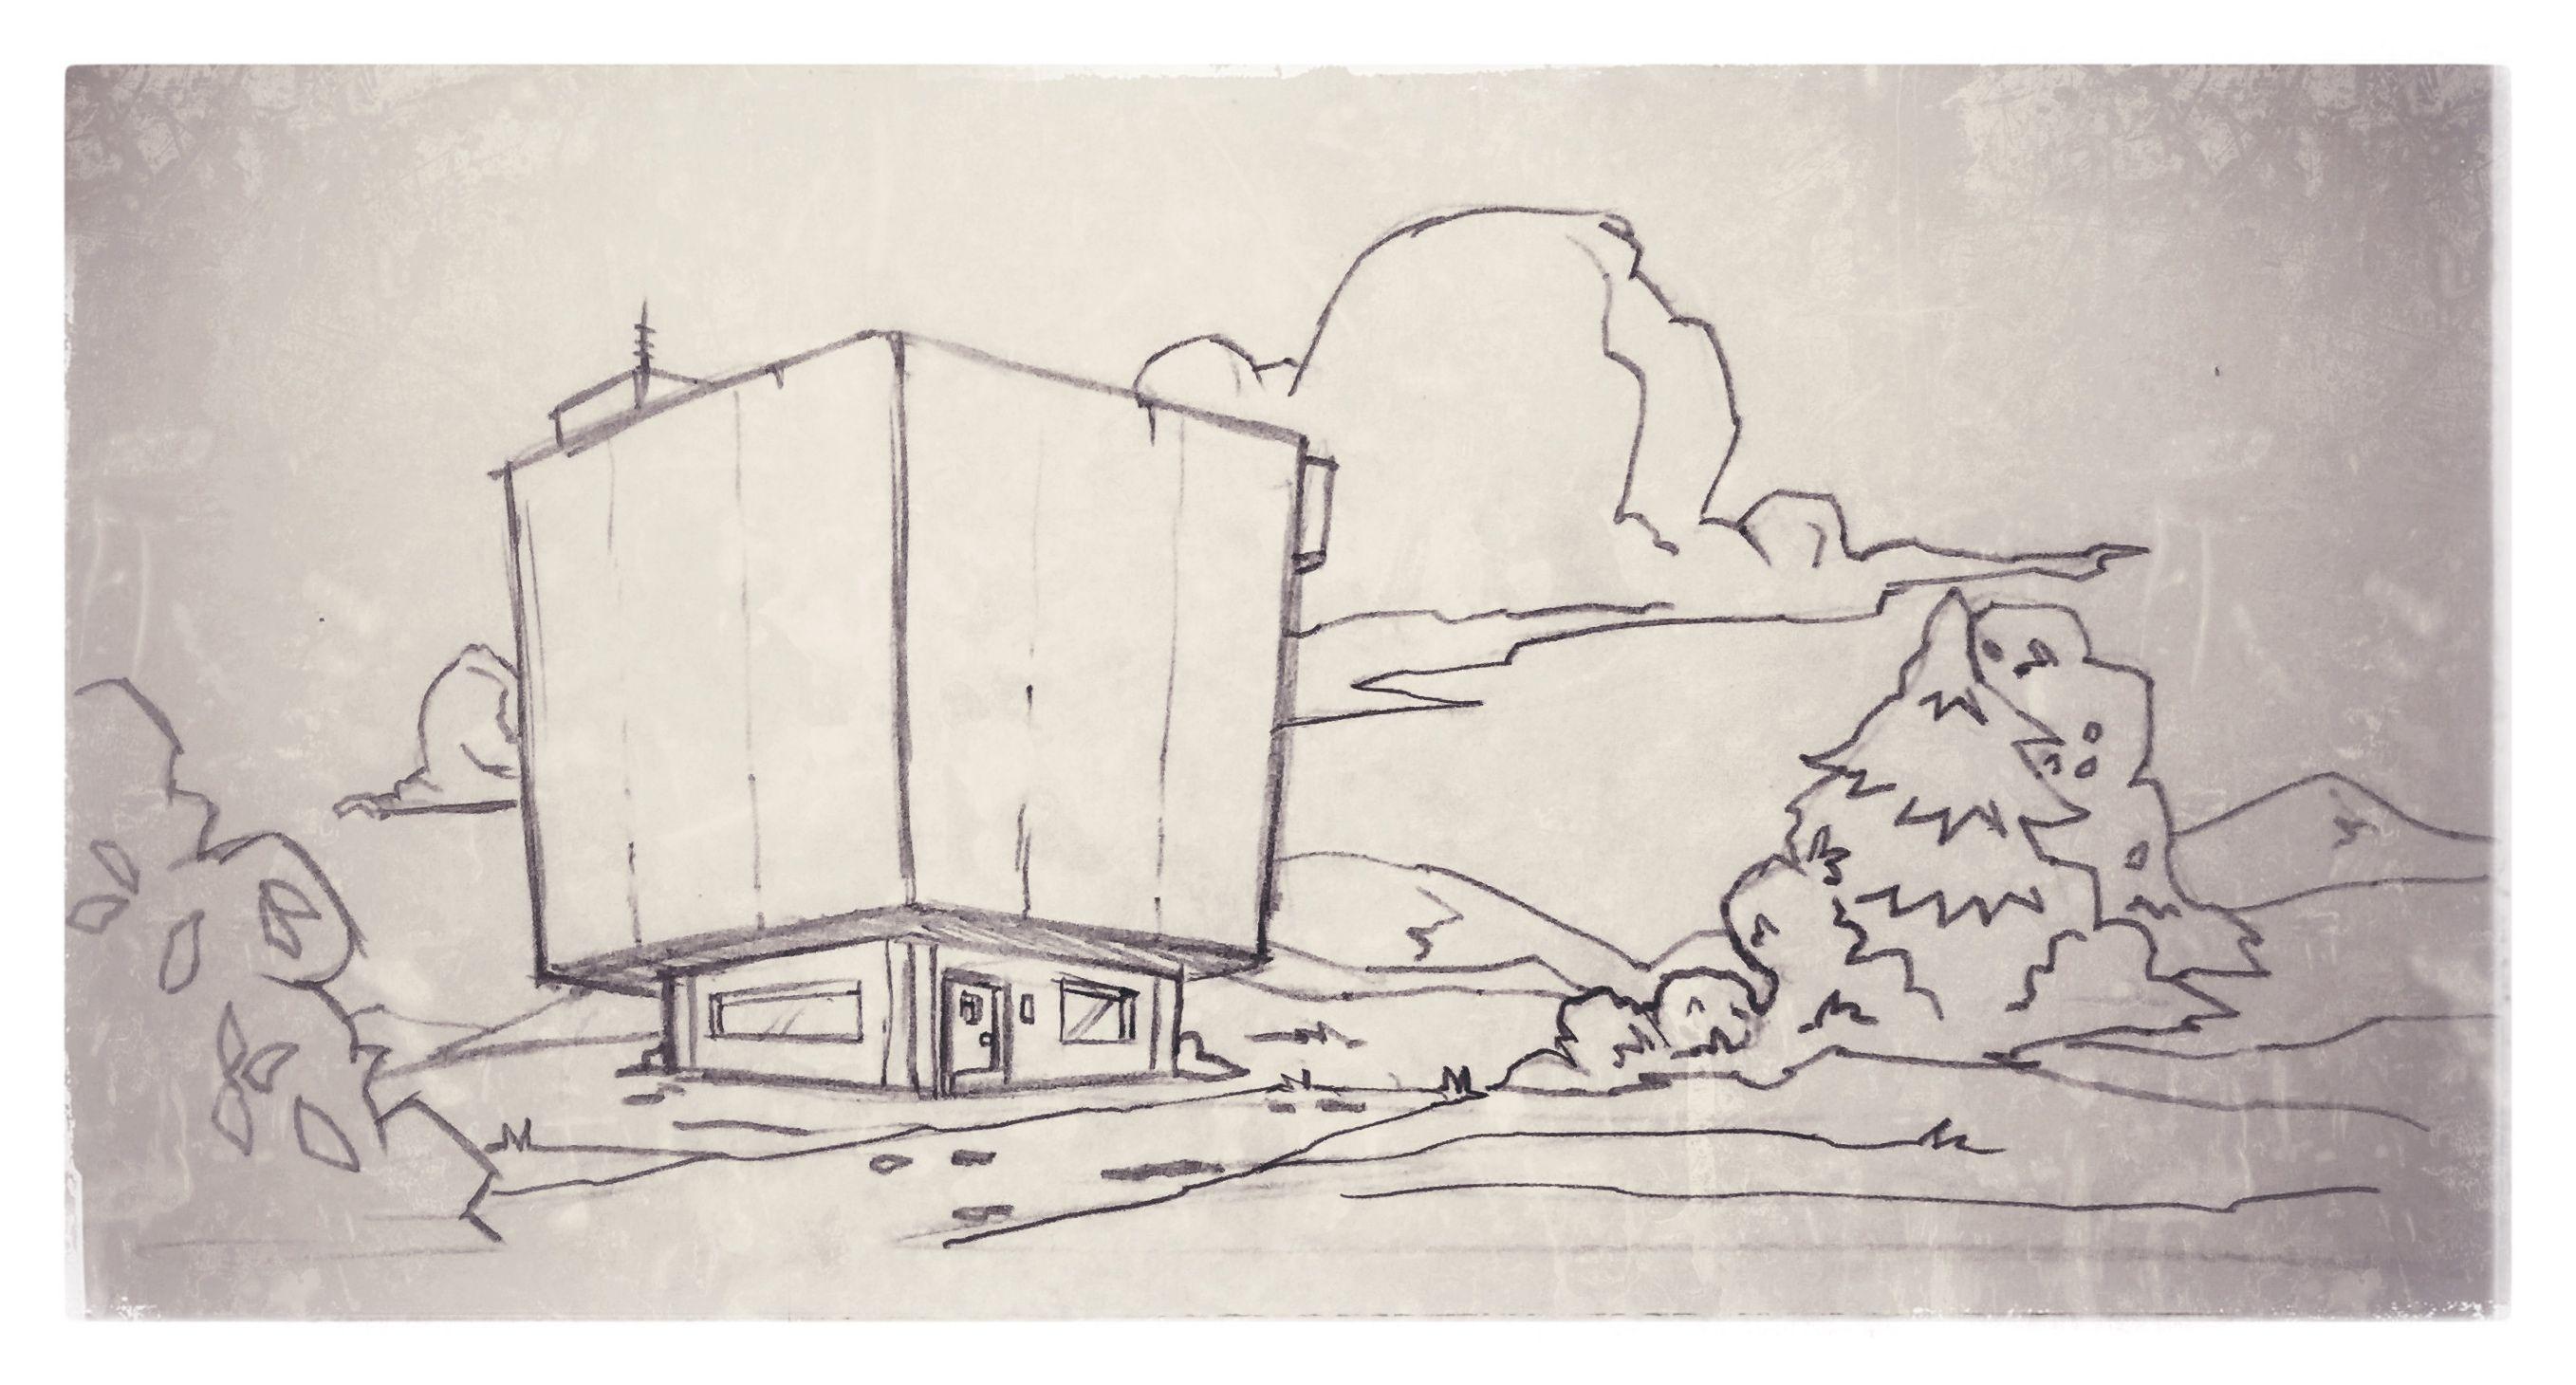 13 cartoon stylized animated background scene sketch modern